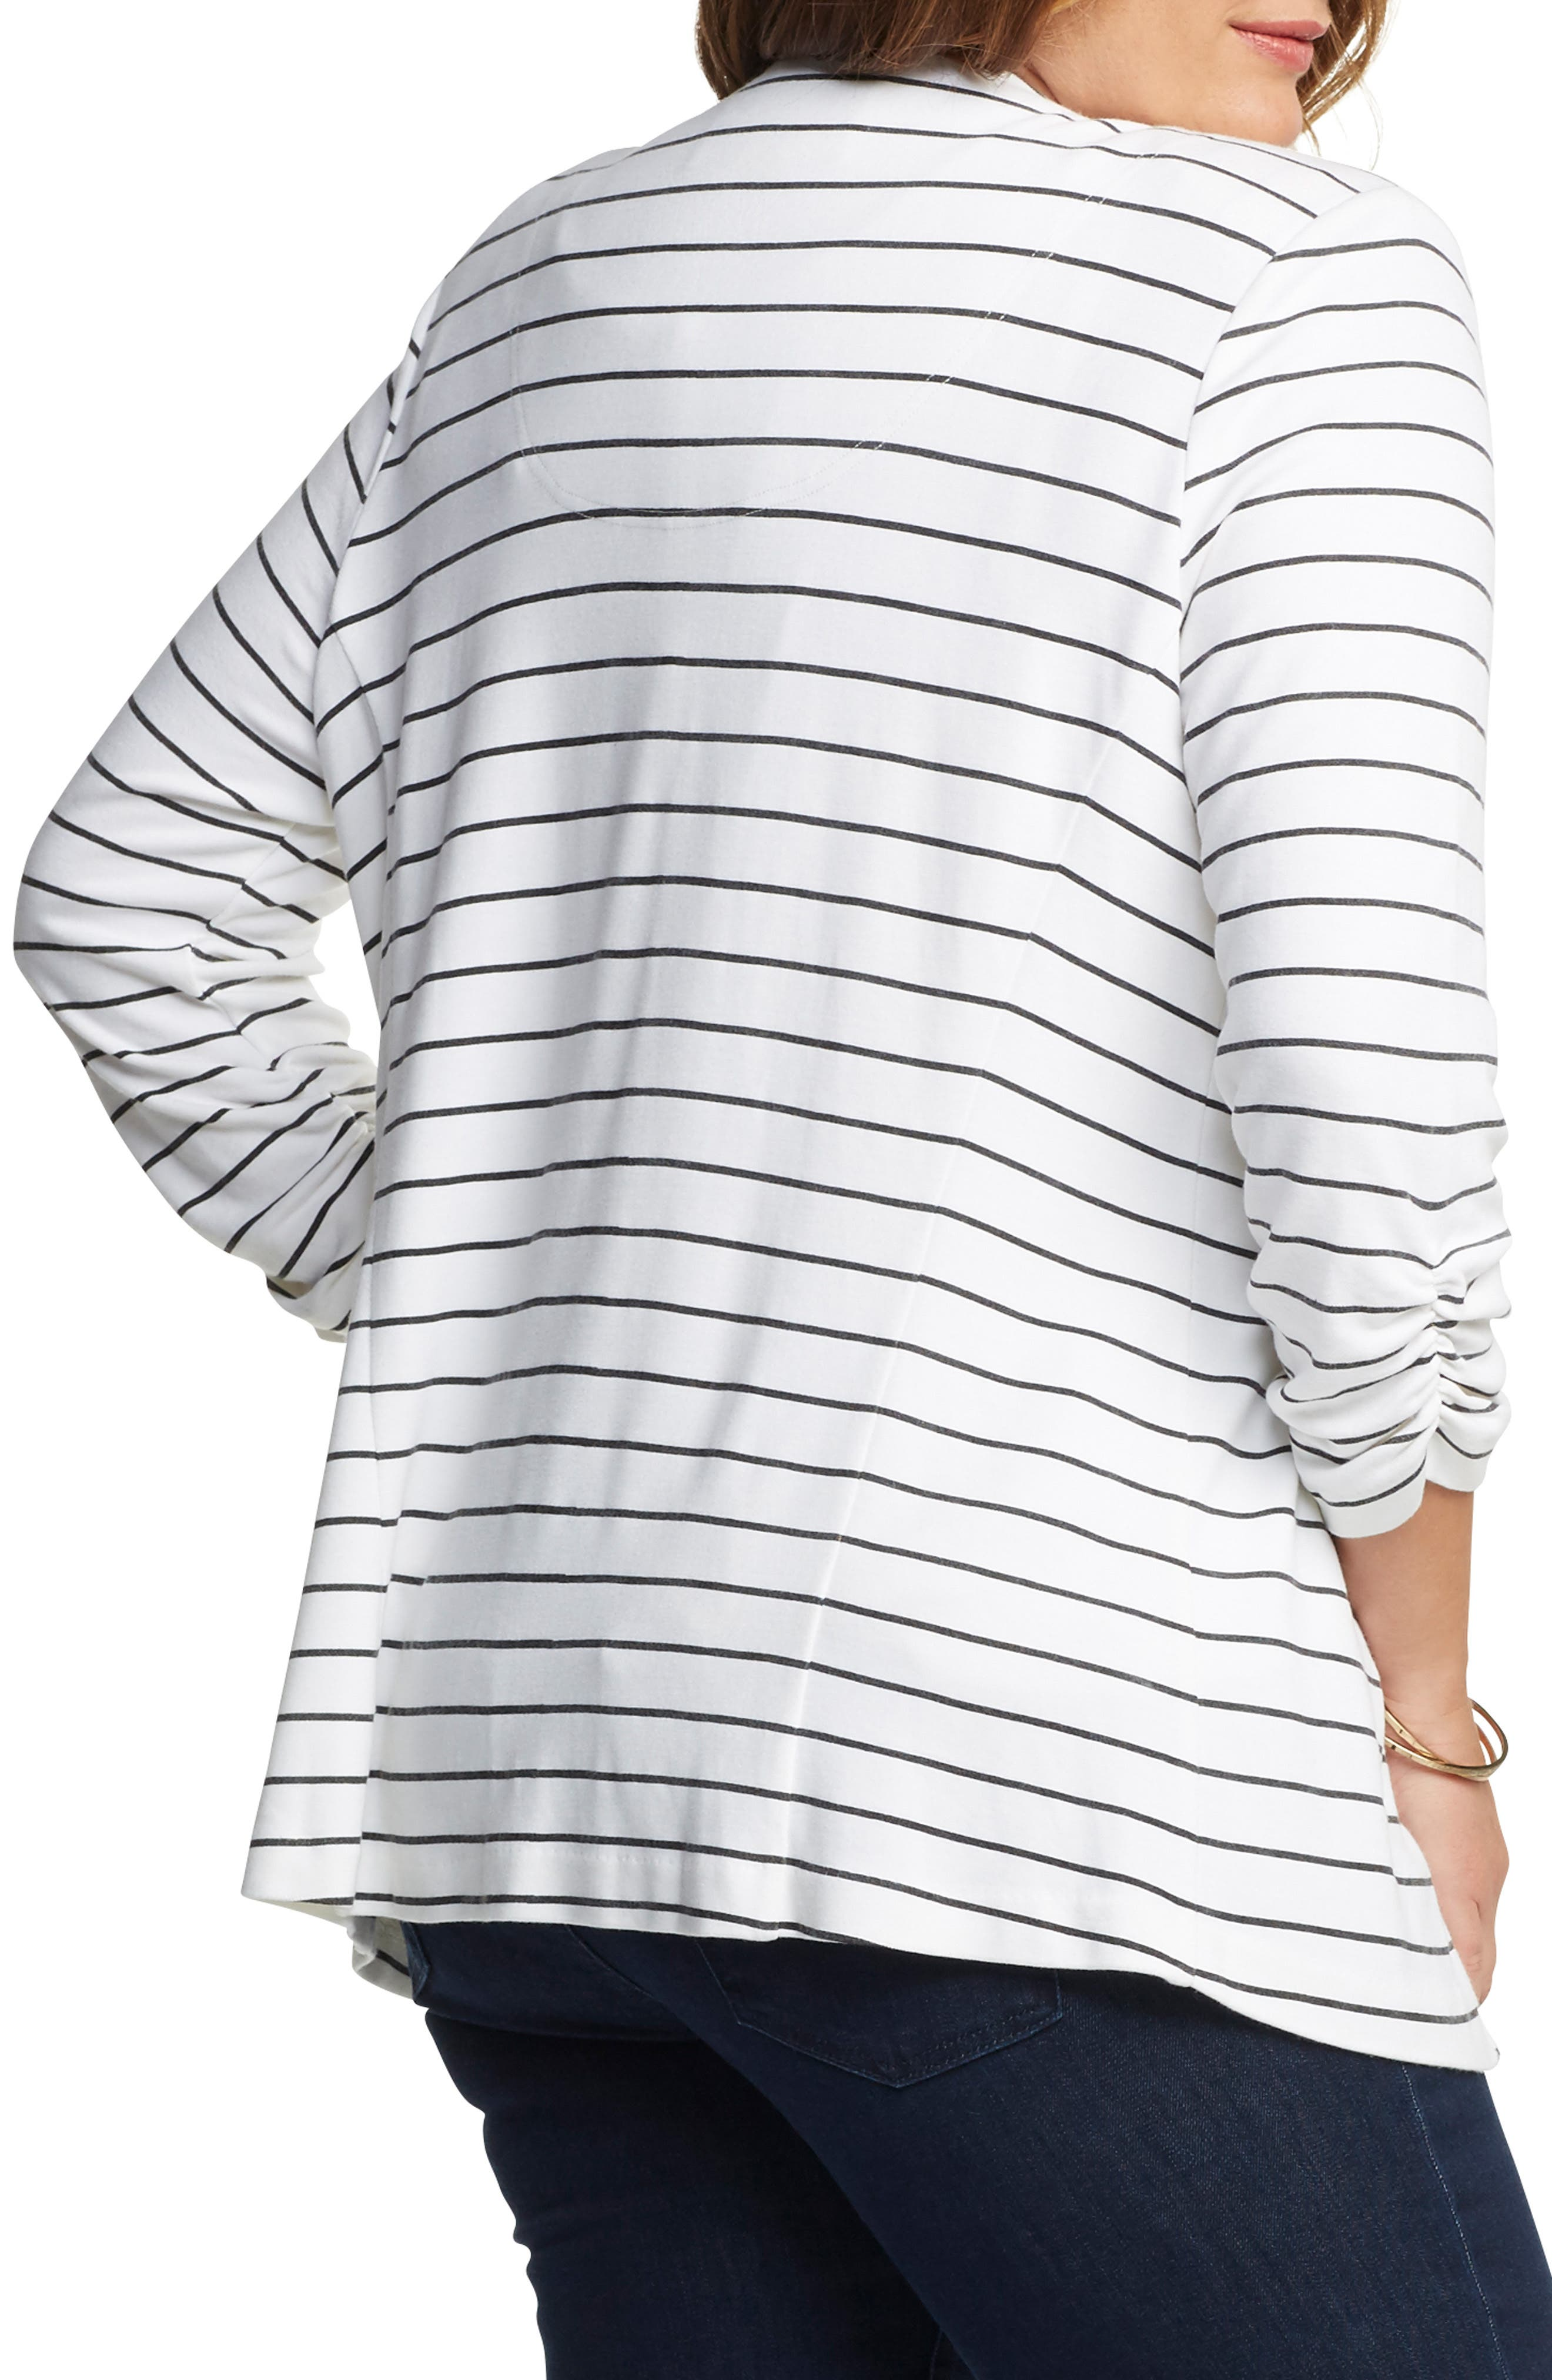 'Olga' Knit Jacket,                             Alternate thumbnail 2, color,                             Open Stripe